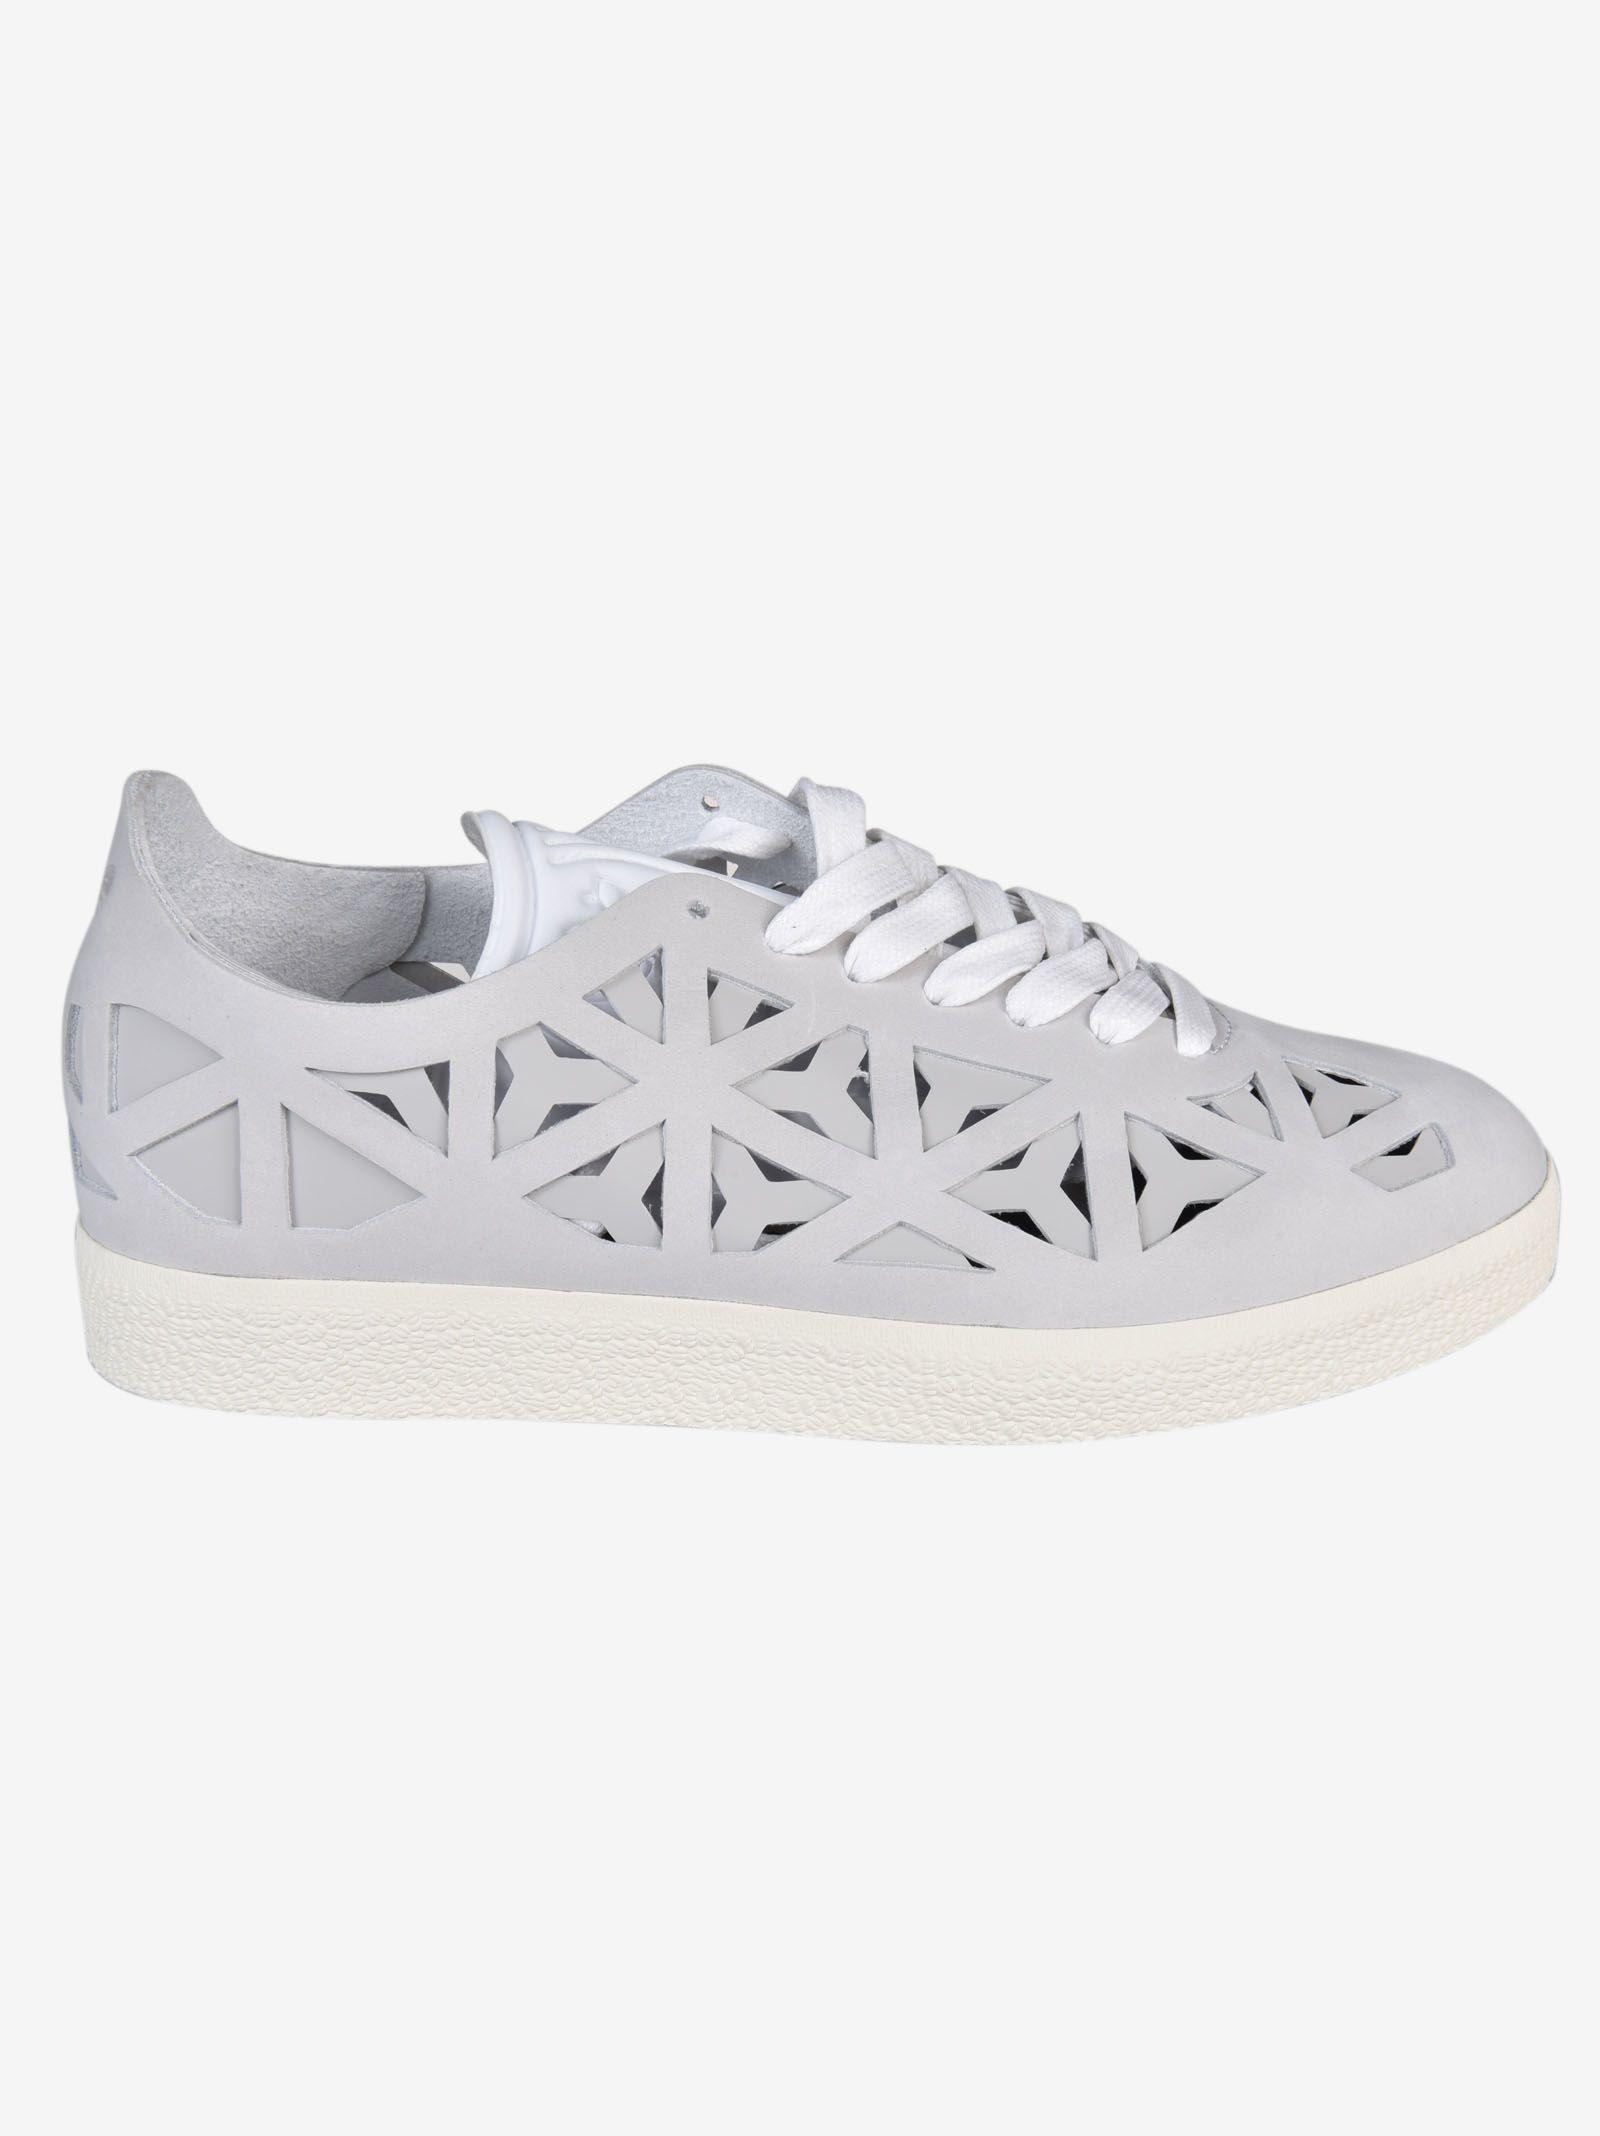 Adidas Gazelle Cutout Sneakers